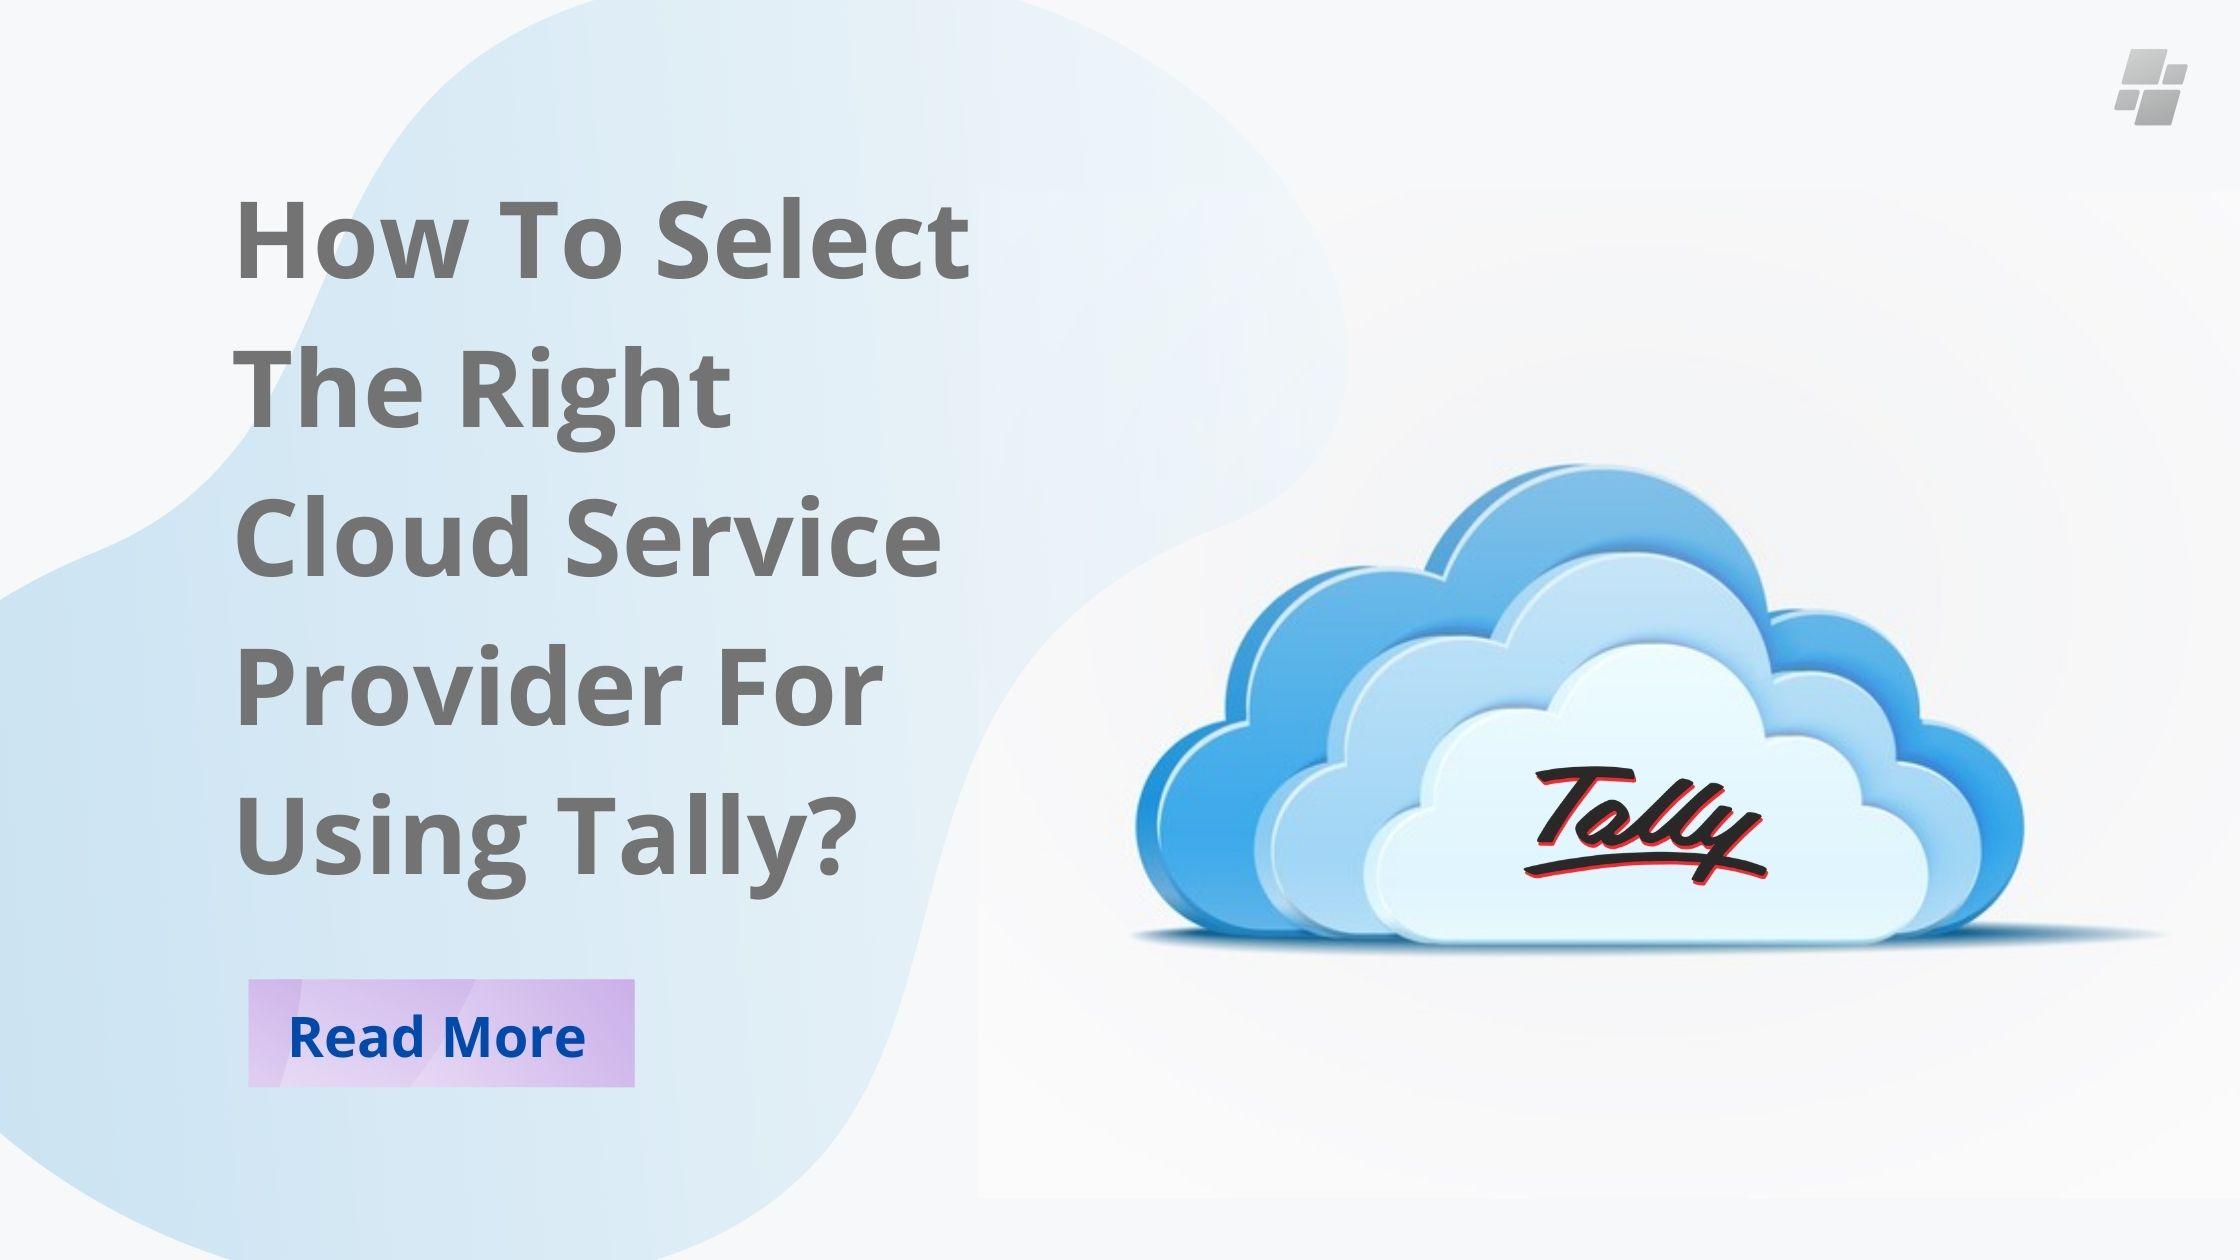 Tally cloud service provider